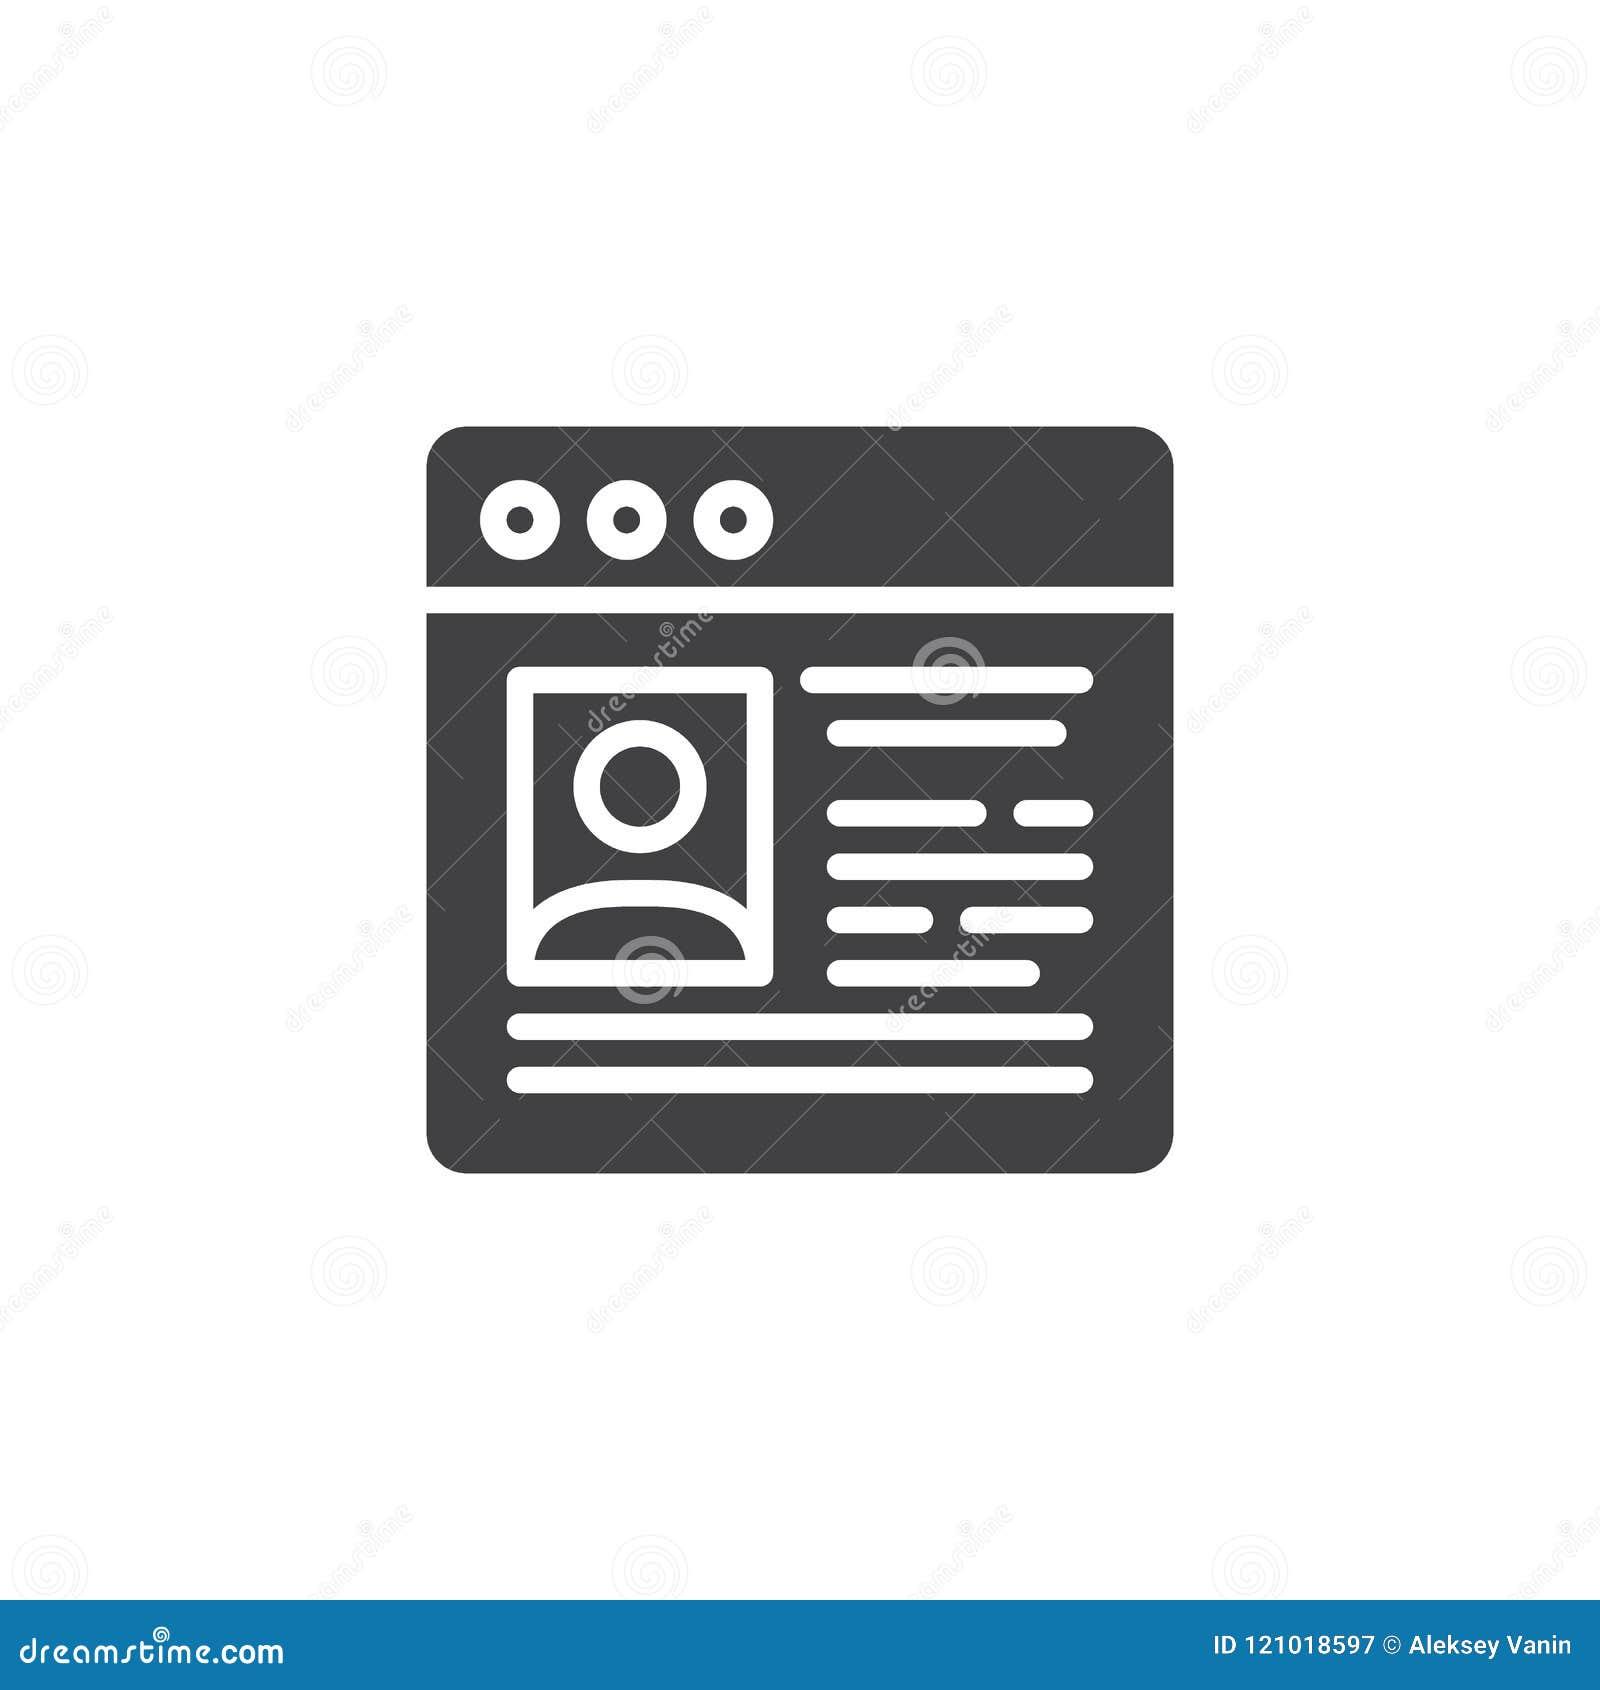 Website Cv vector icon stock vector. Illustration of logo - 121018597